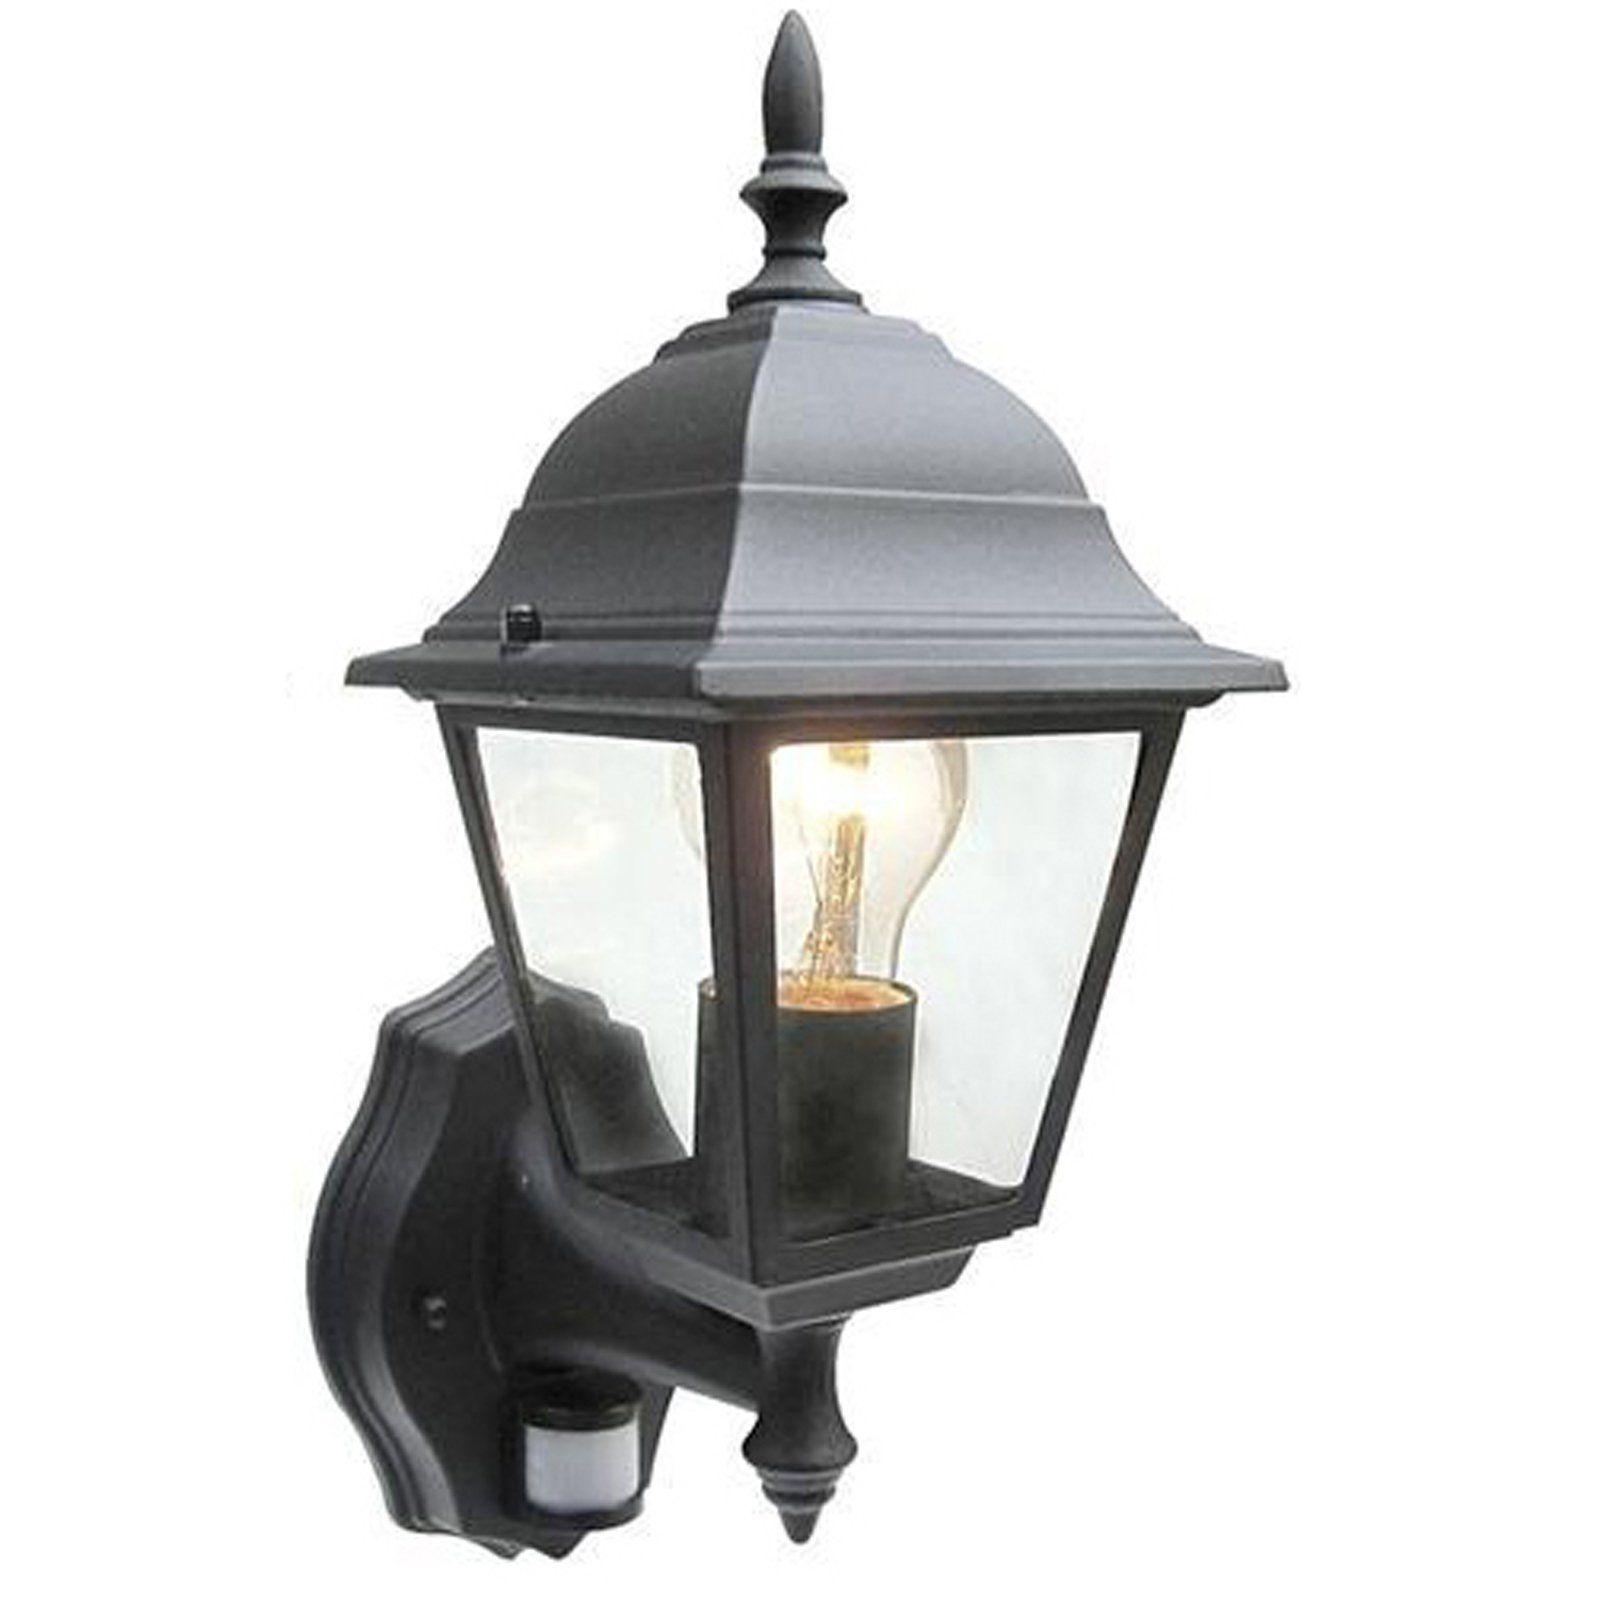 EL 40115 Black Outdoor Half Wall Lantern with PIR IP44 from Lights